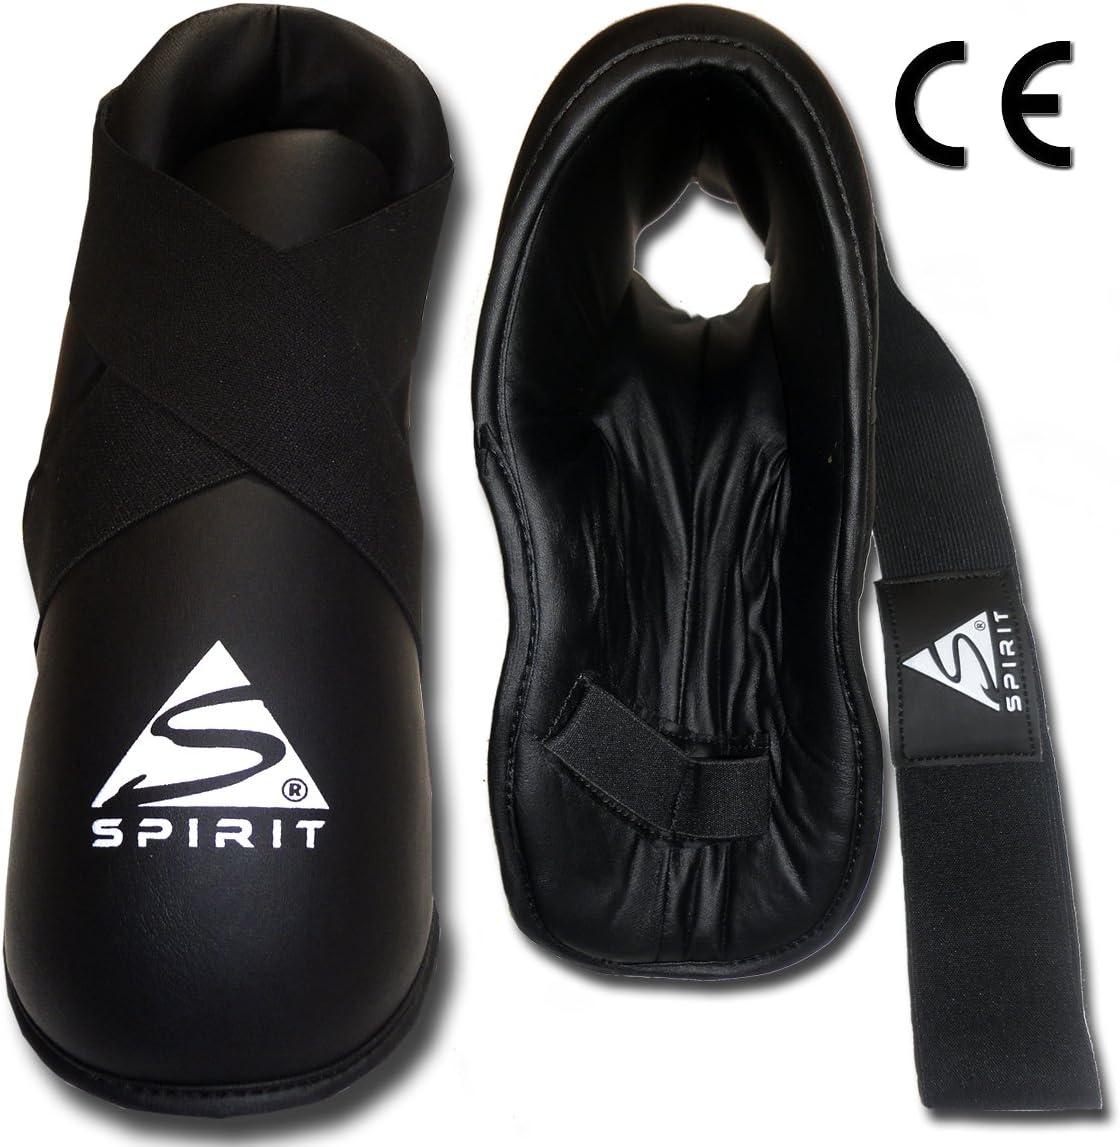 Botas de entrenamiento de kick boxing Spirit PU